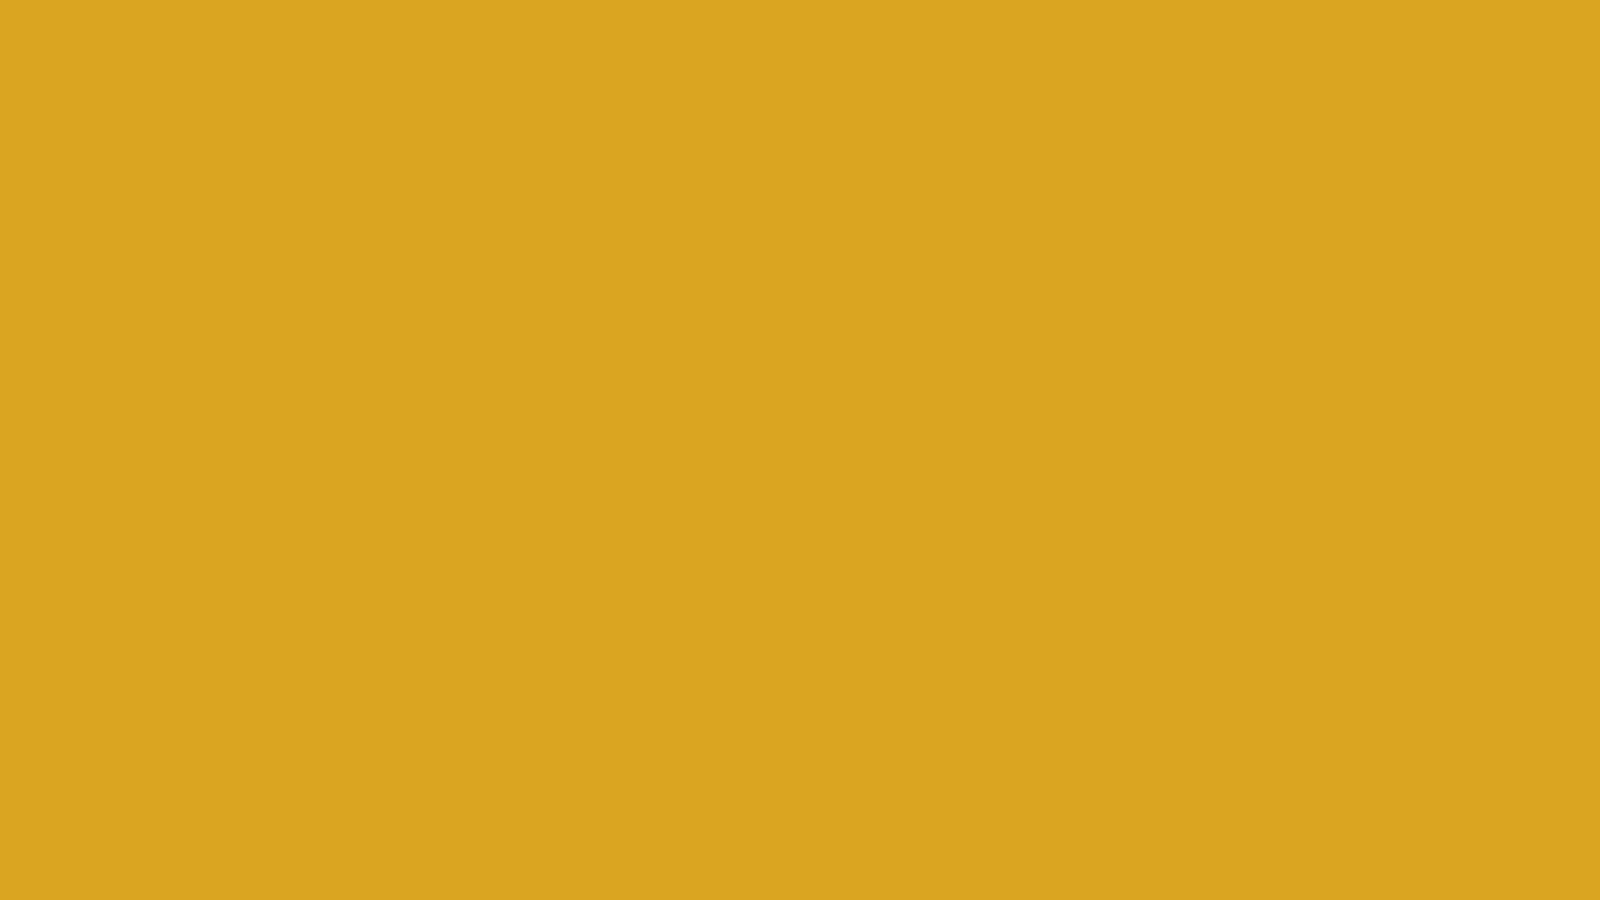 1600x900 Goldenrod Solid Color Background